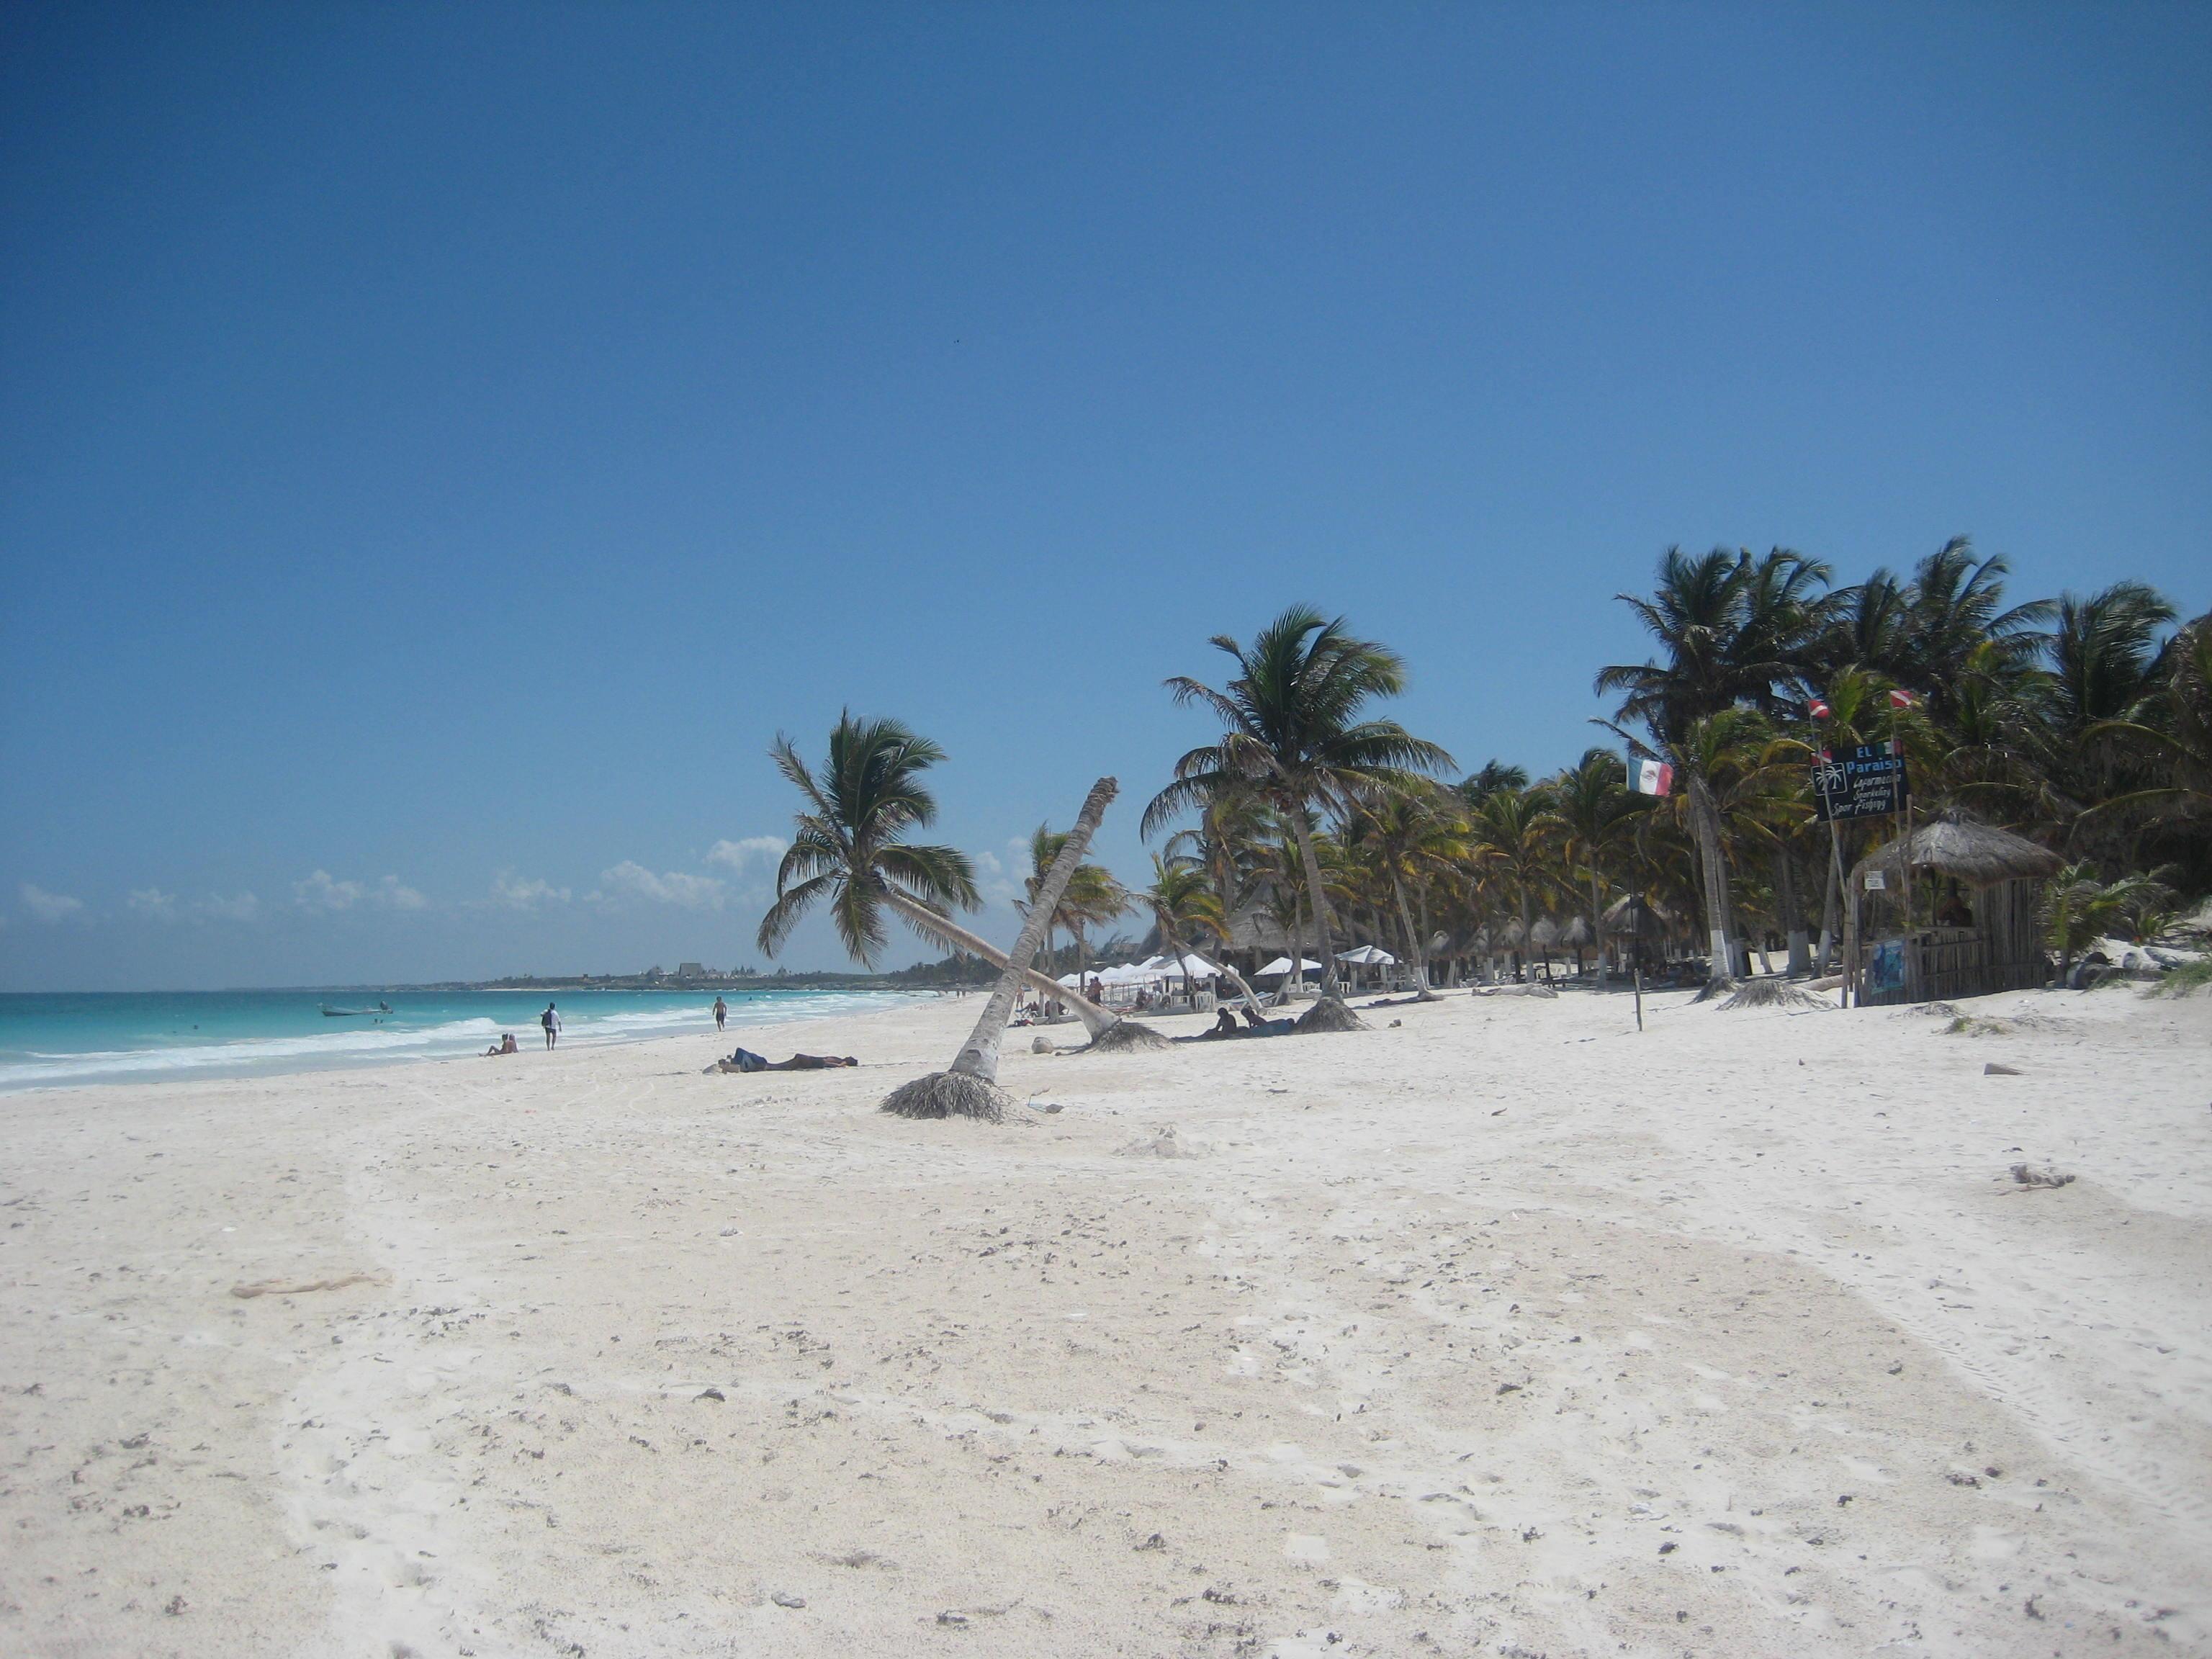 hopskipdive playa el paraiso tulum mexico